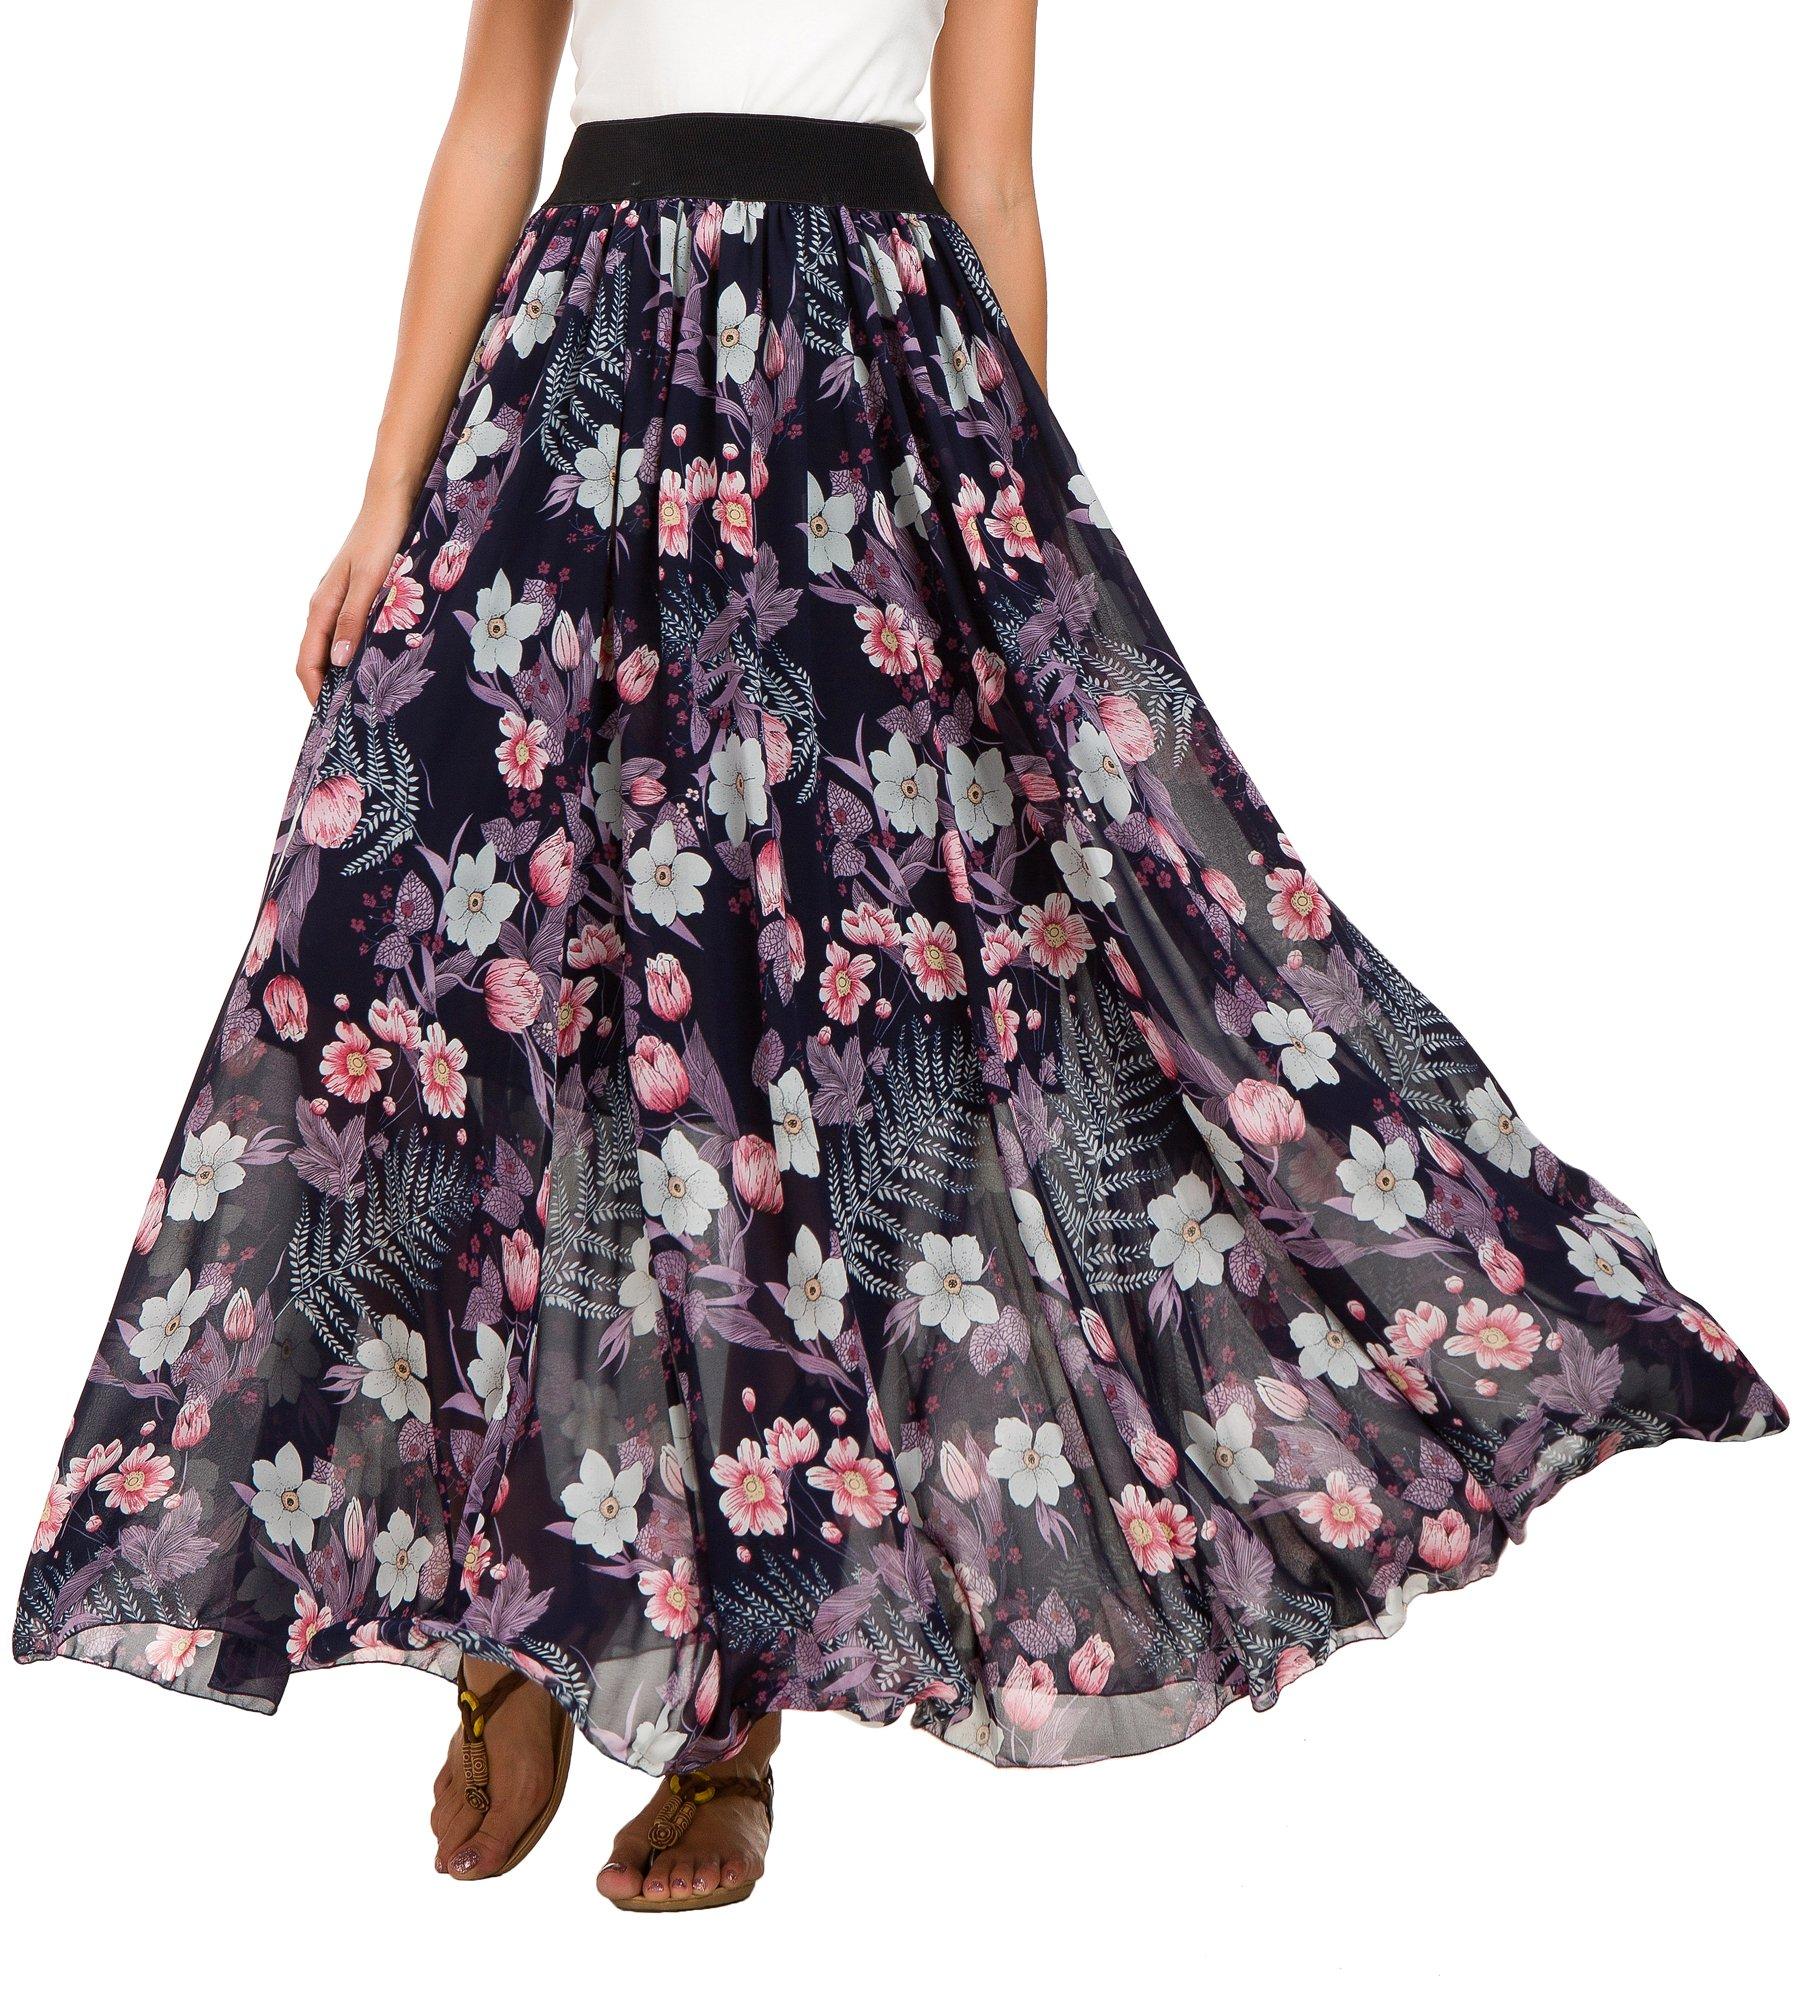 Urban CoCo Women's Fashion Chiffon High-Waist Summer Long Maxi Skirt (XL, 2)